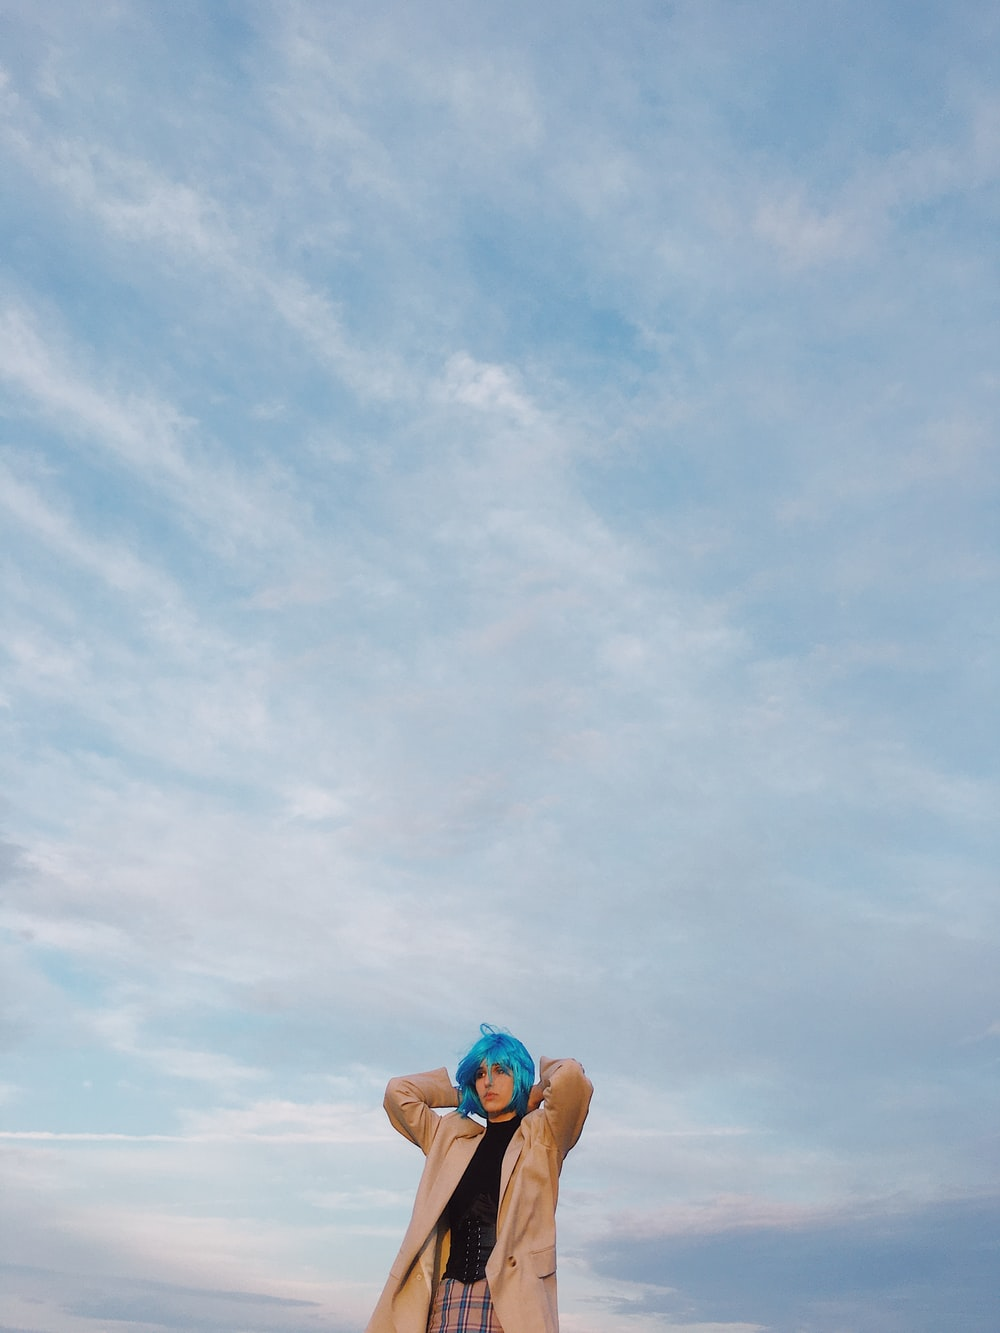 woman in blue bikini top and blue denim daisy dukes sitting on beach during daytime